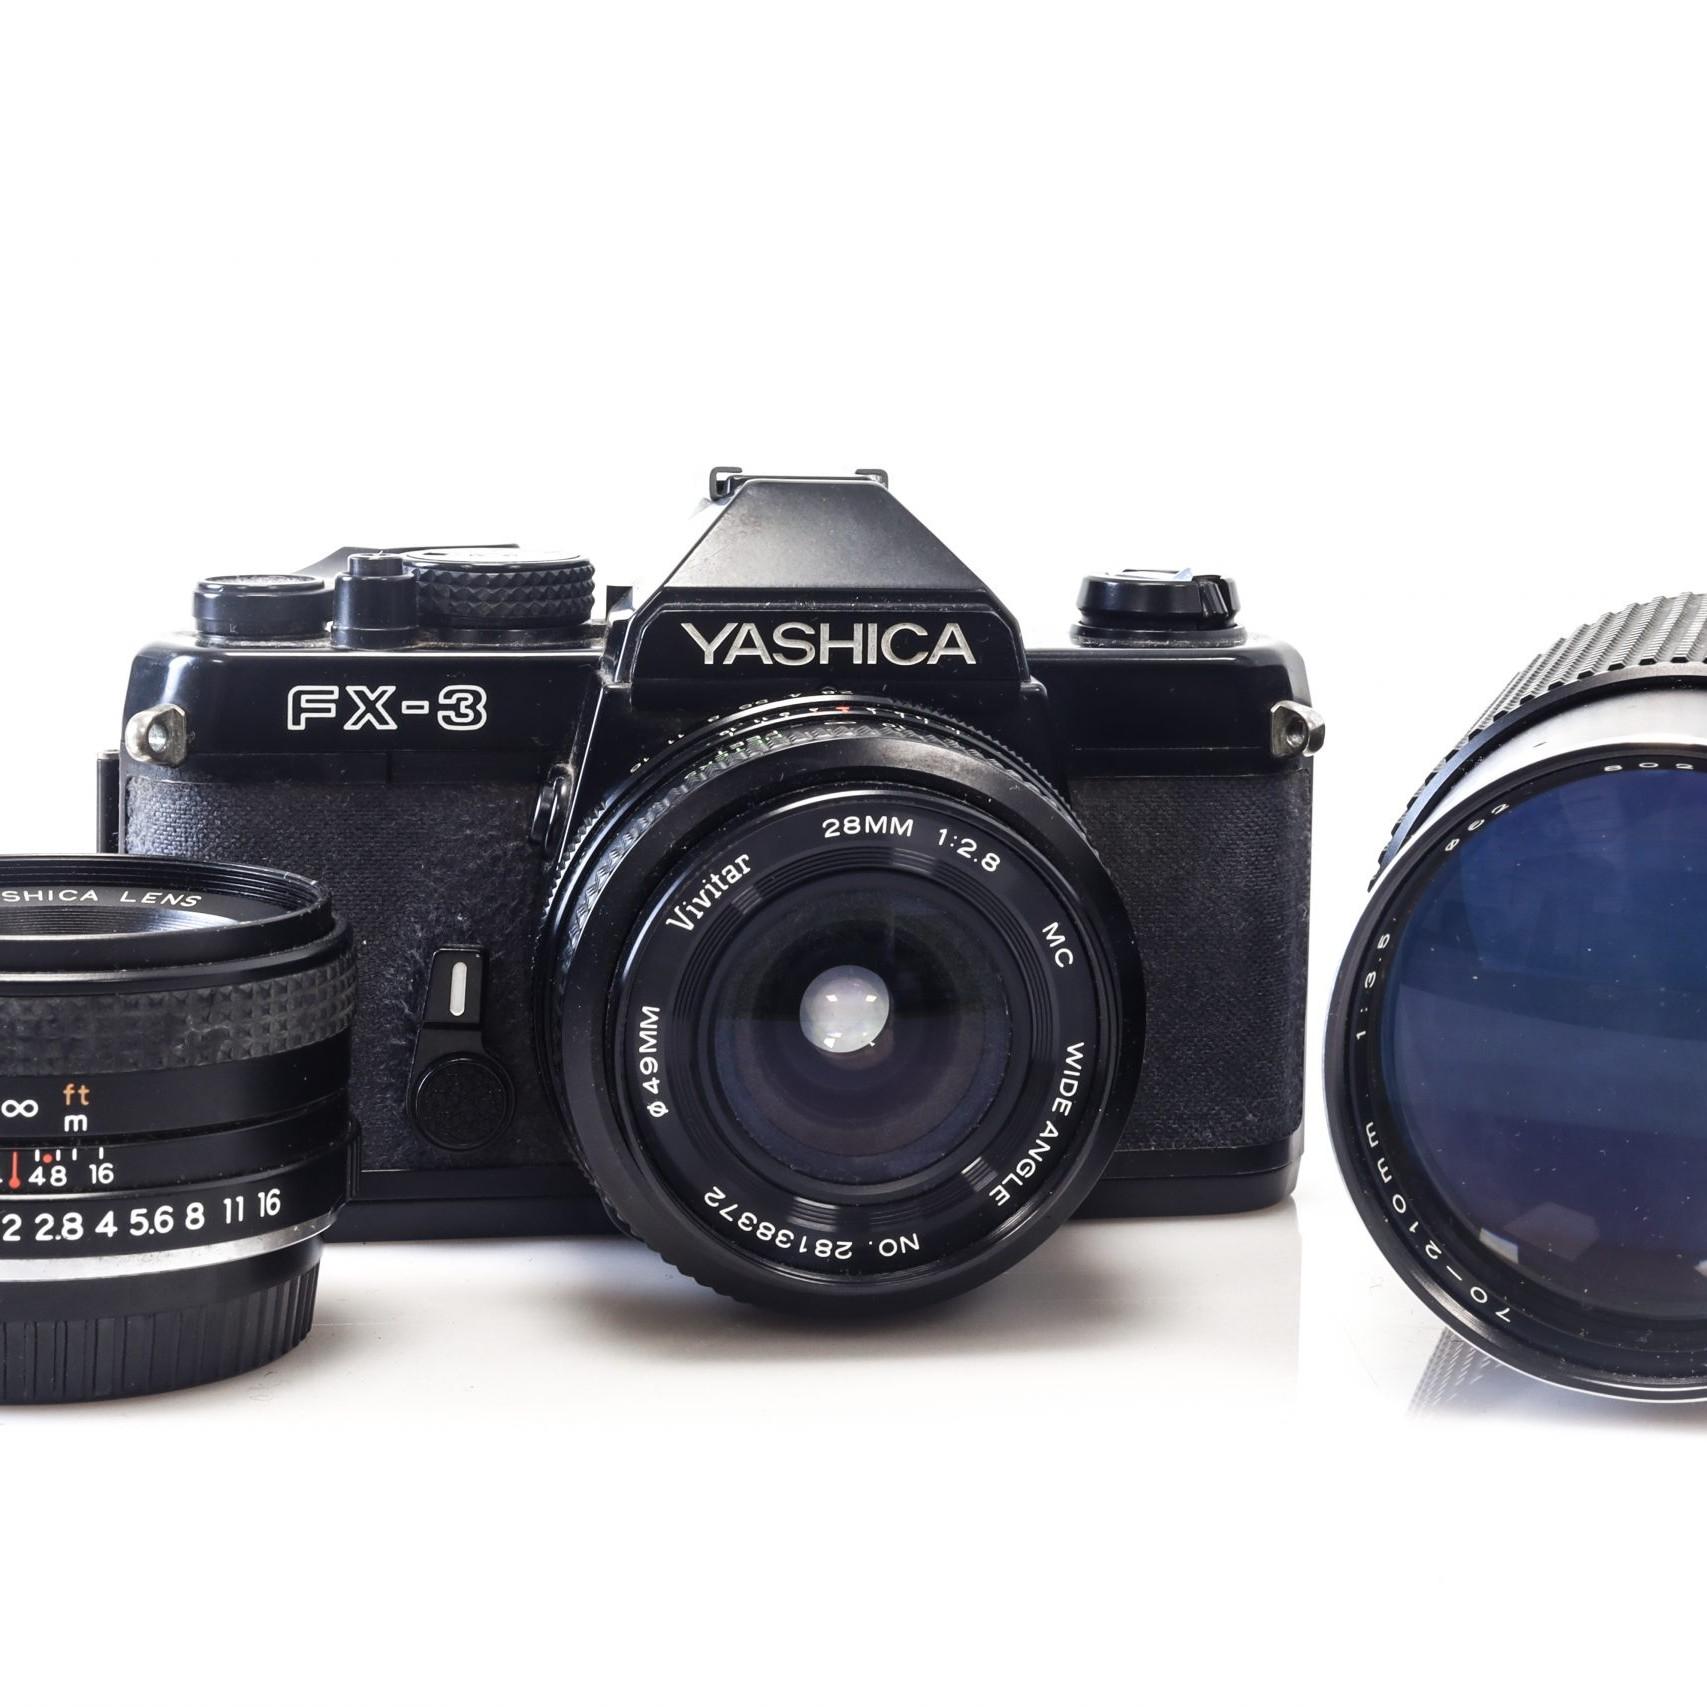 Lovely Yashica FX-3 35mm Film Camera with 28mm Lens + 50mm Lens + 70 - 210mm Lens